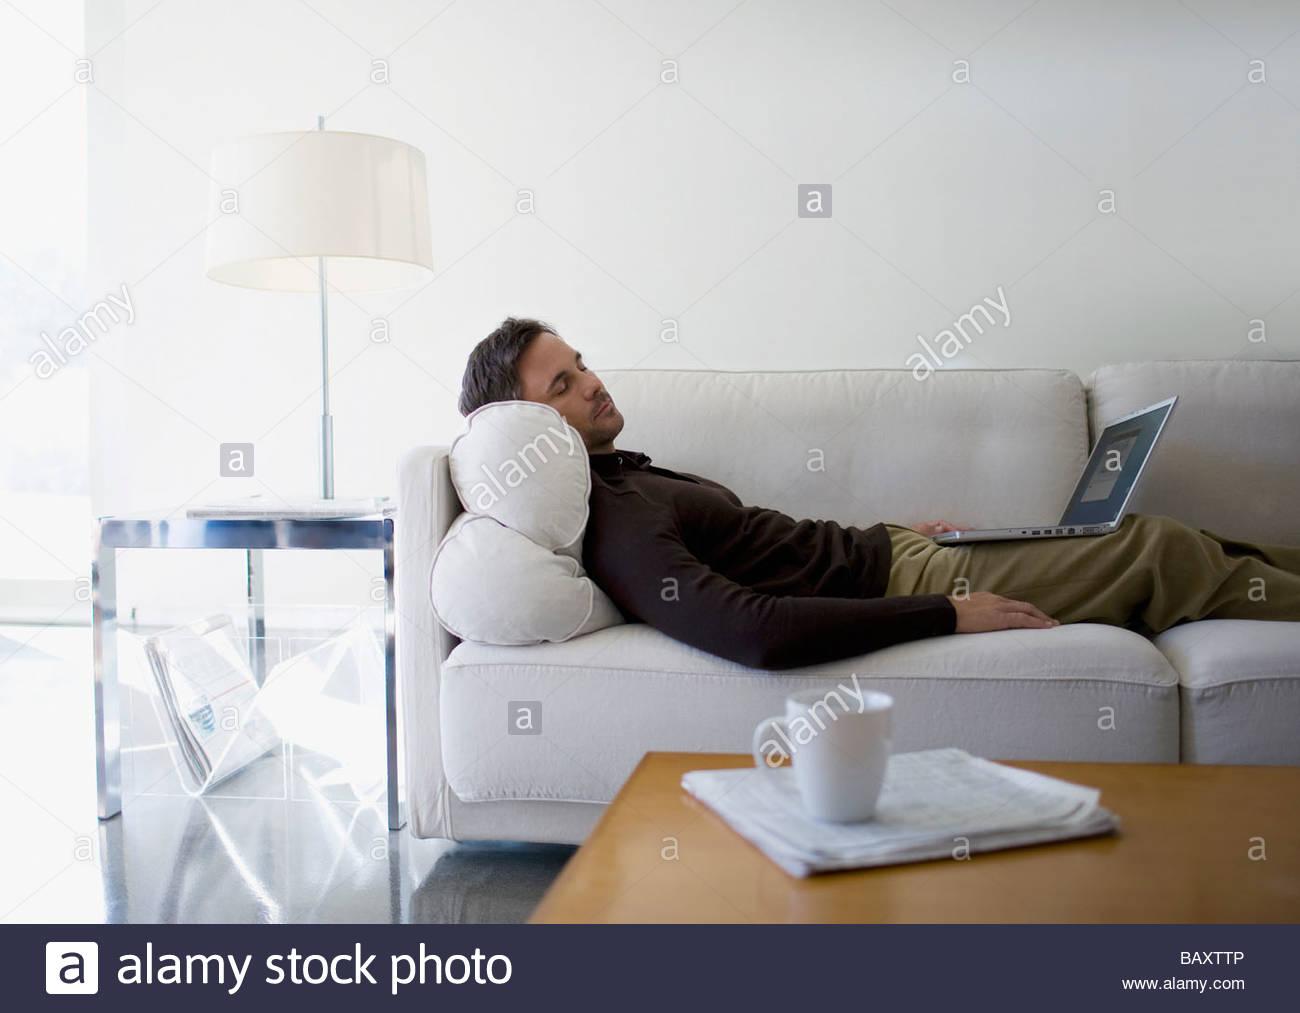 Man with laptop sleeping on sofa - Stock Image